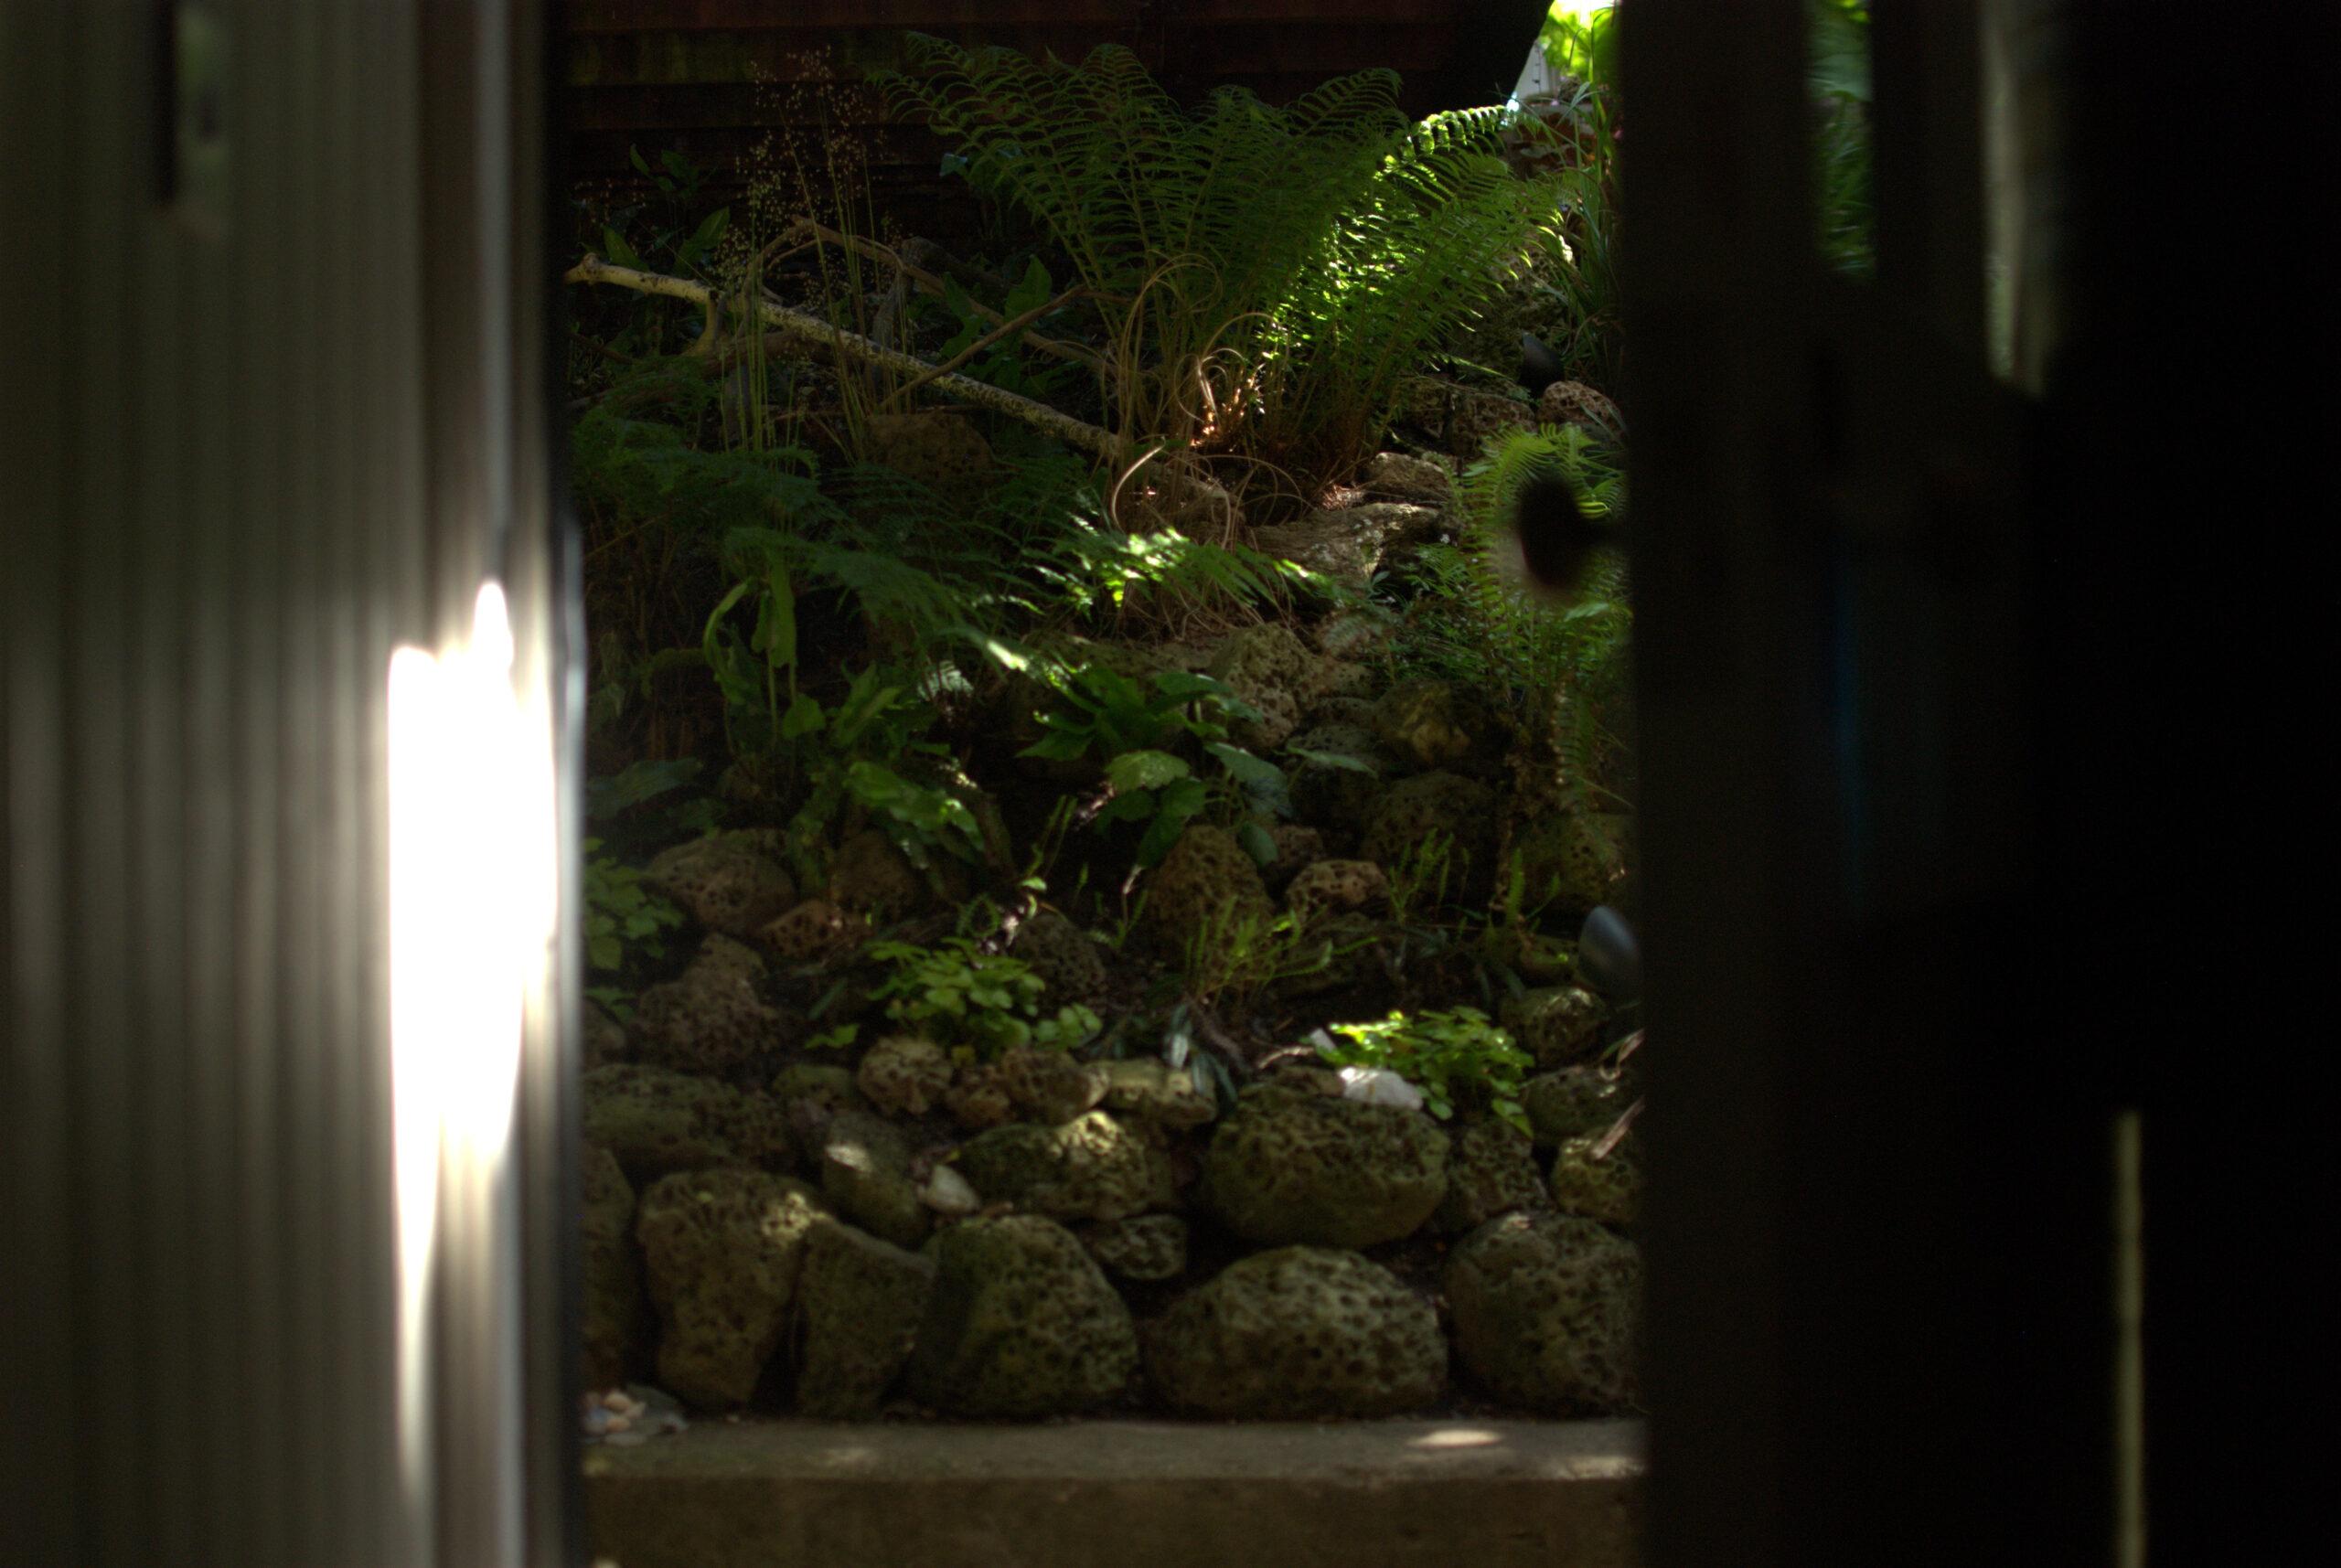 Glimpses of the limestone rockery and fern garden